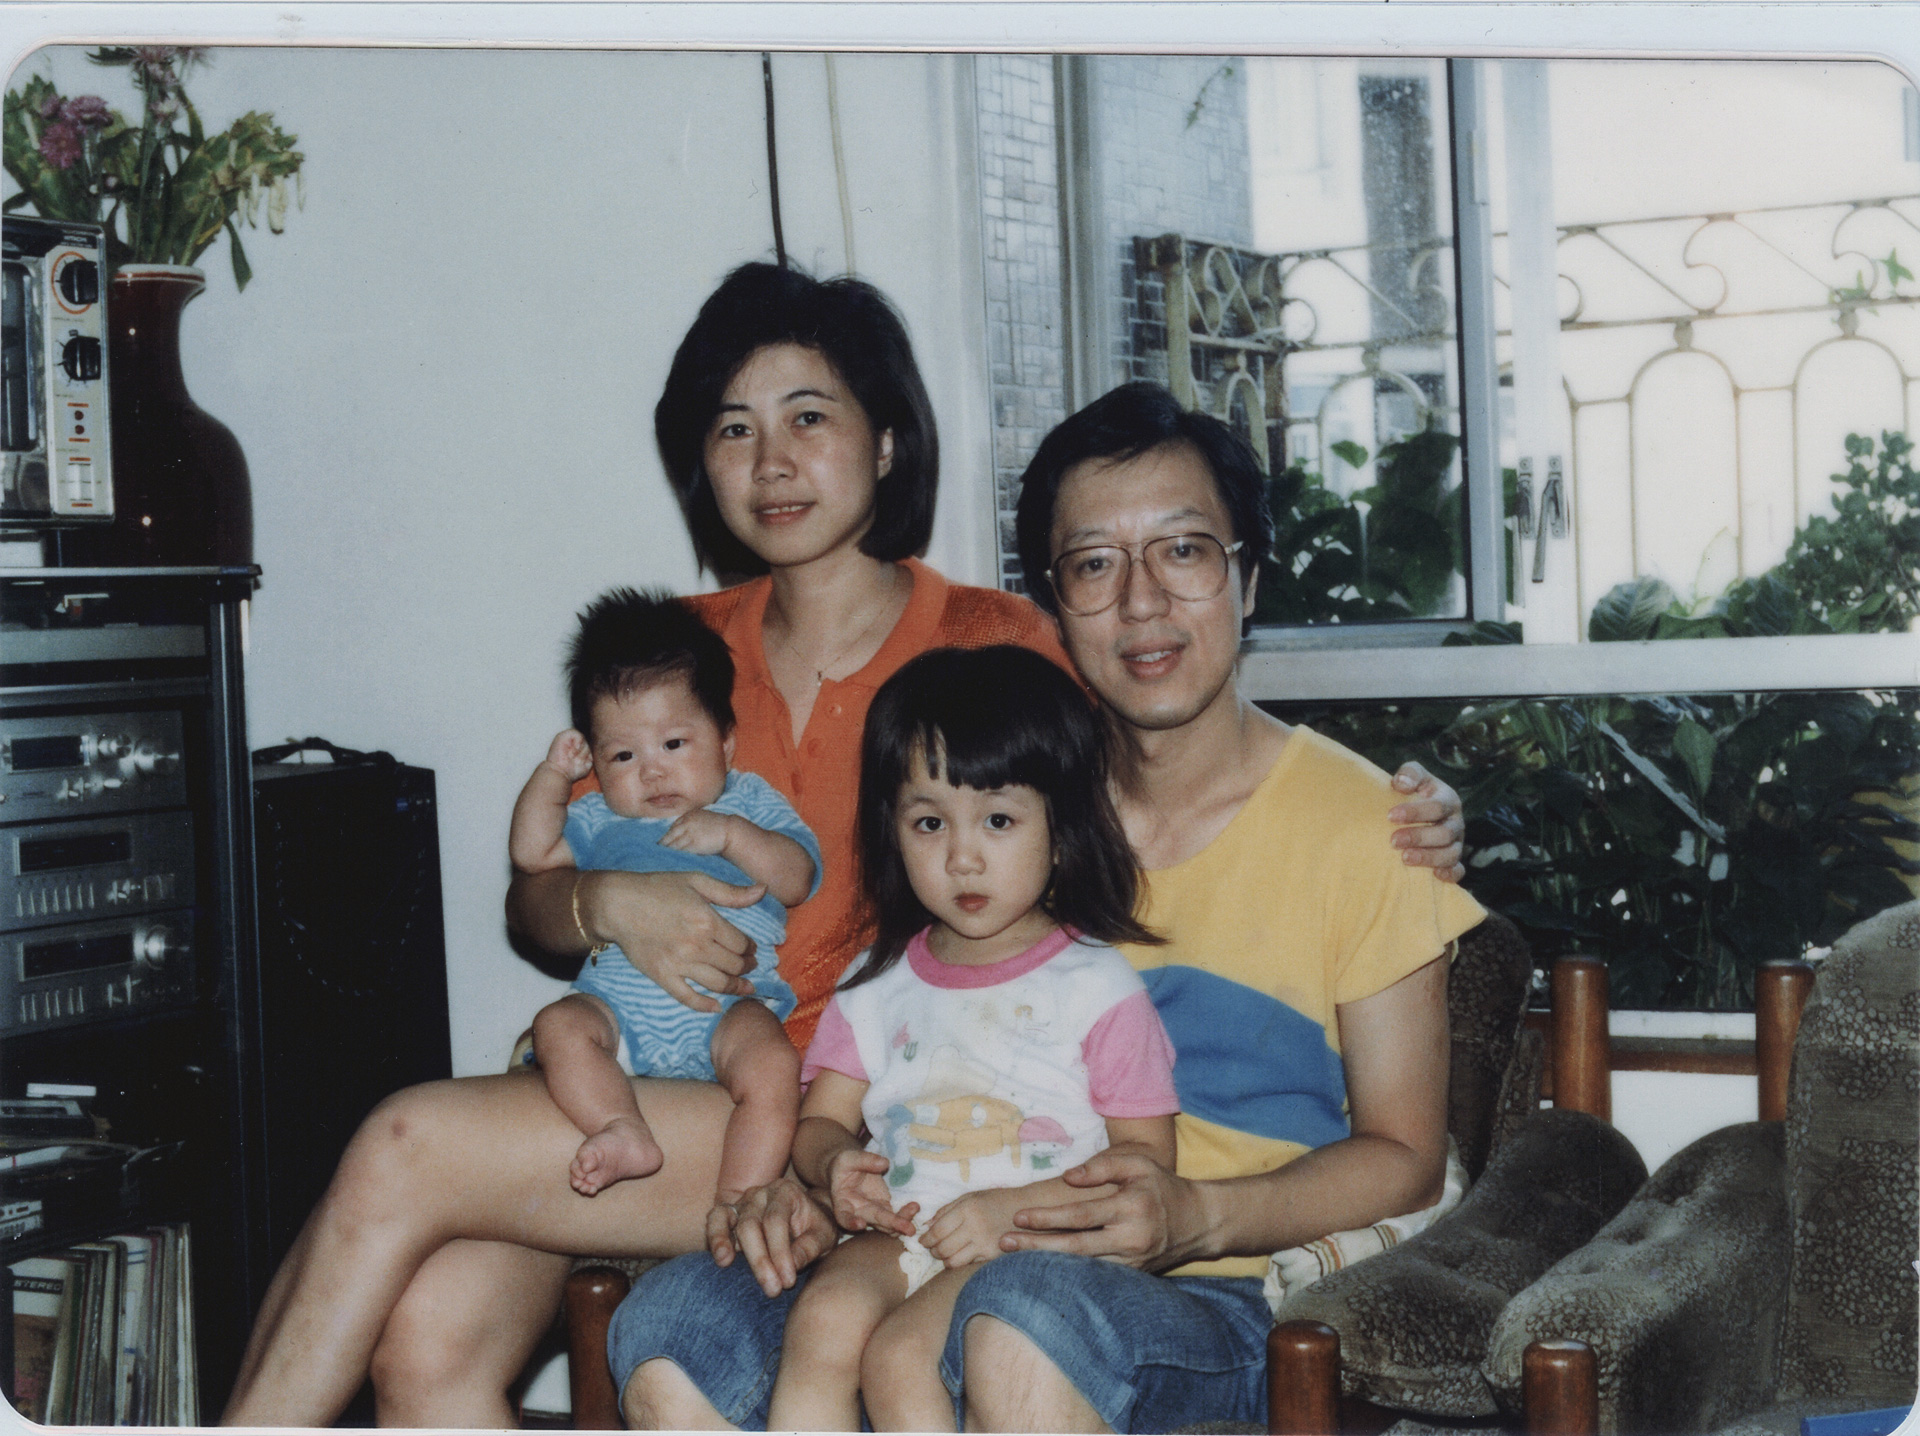 Vikkipedia-GreyHair-Img20-Family1.jpg